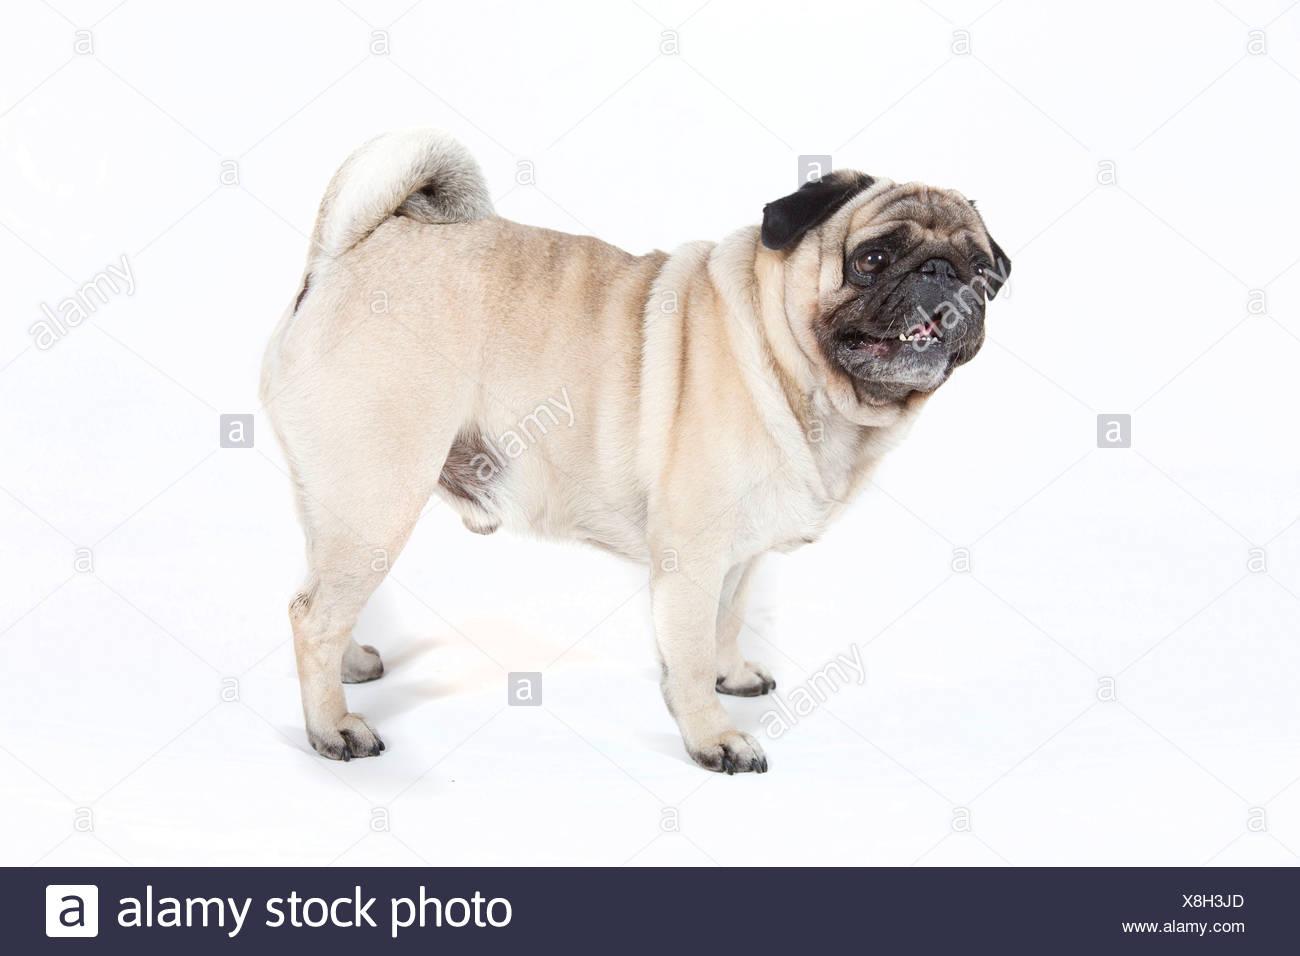 Fat pug, carlin - Stock Image